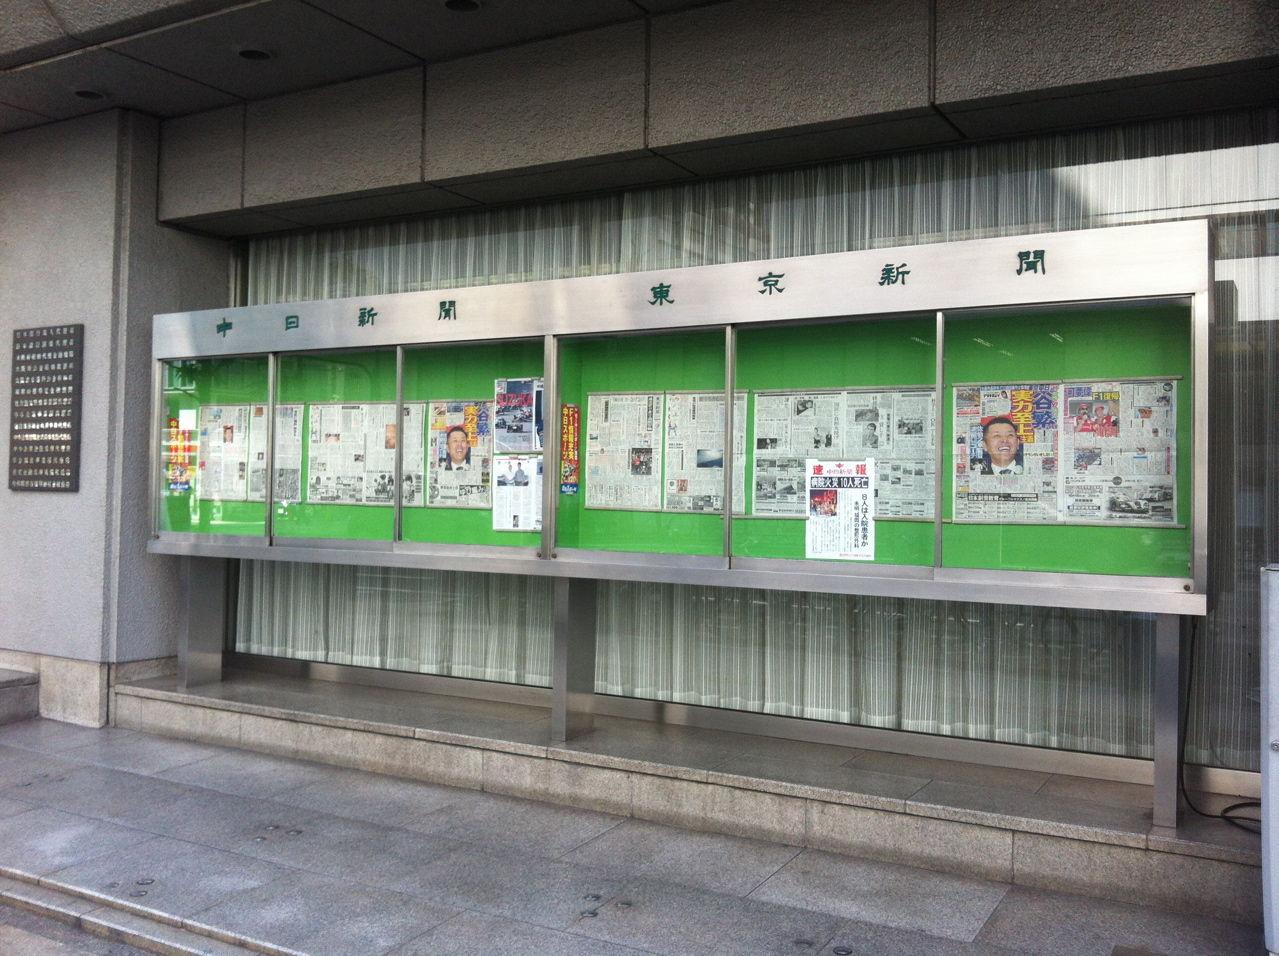 中日新聞・東京新聞買える場所@堂島